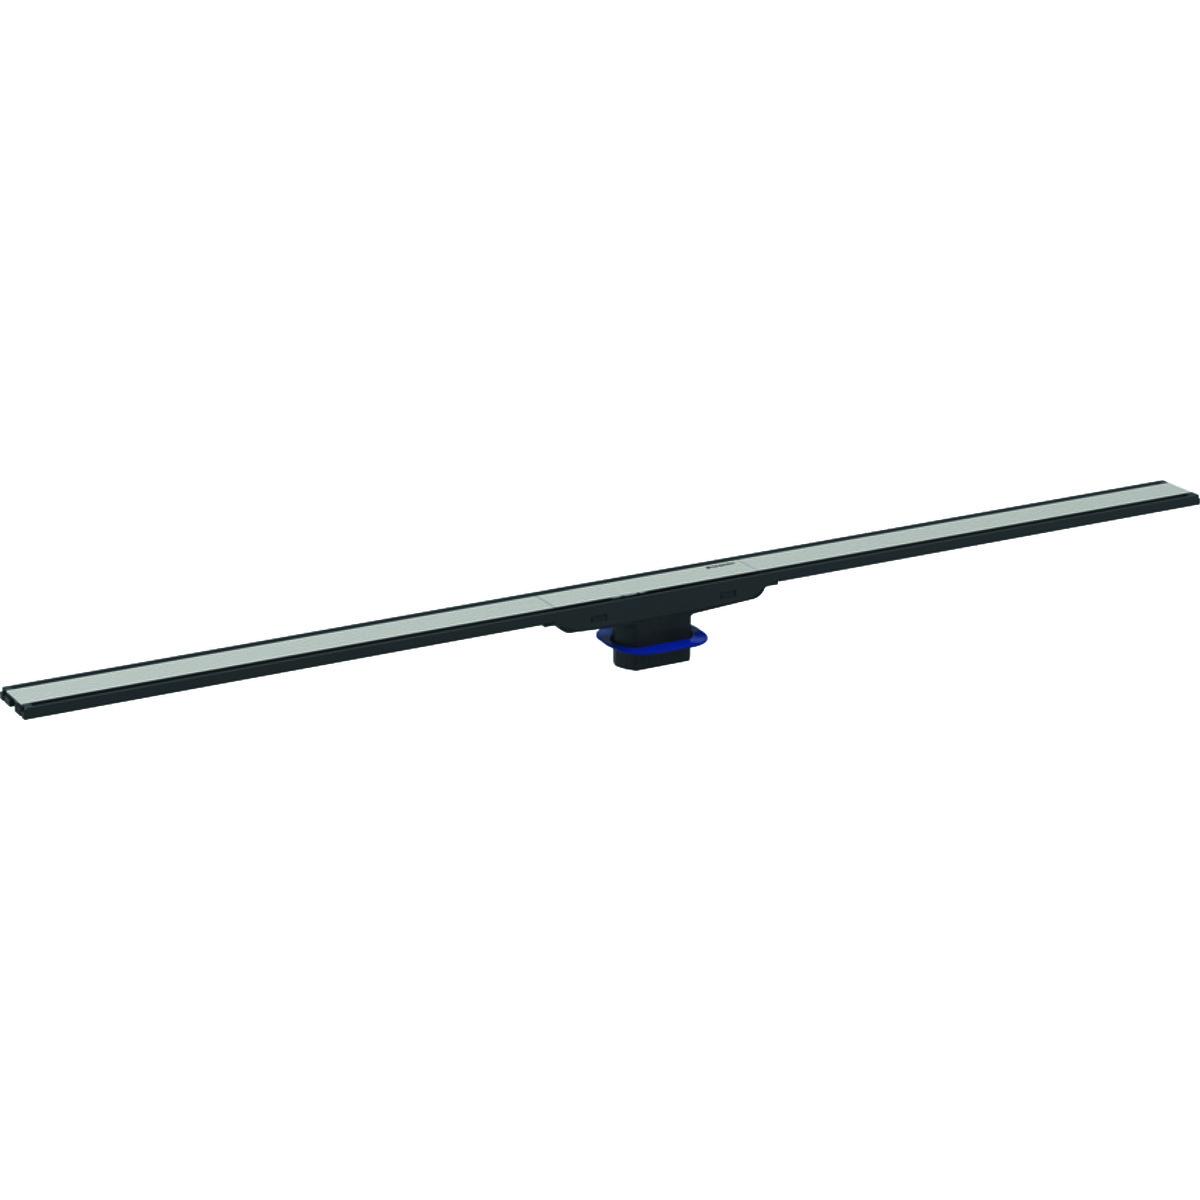 Дренажный канал CleanLine60, тёмный/матовый металл, L30-90см